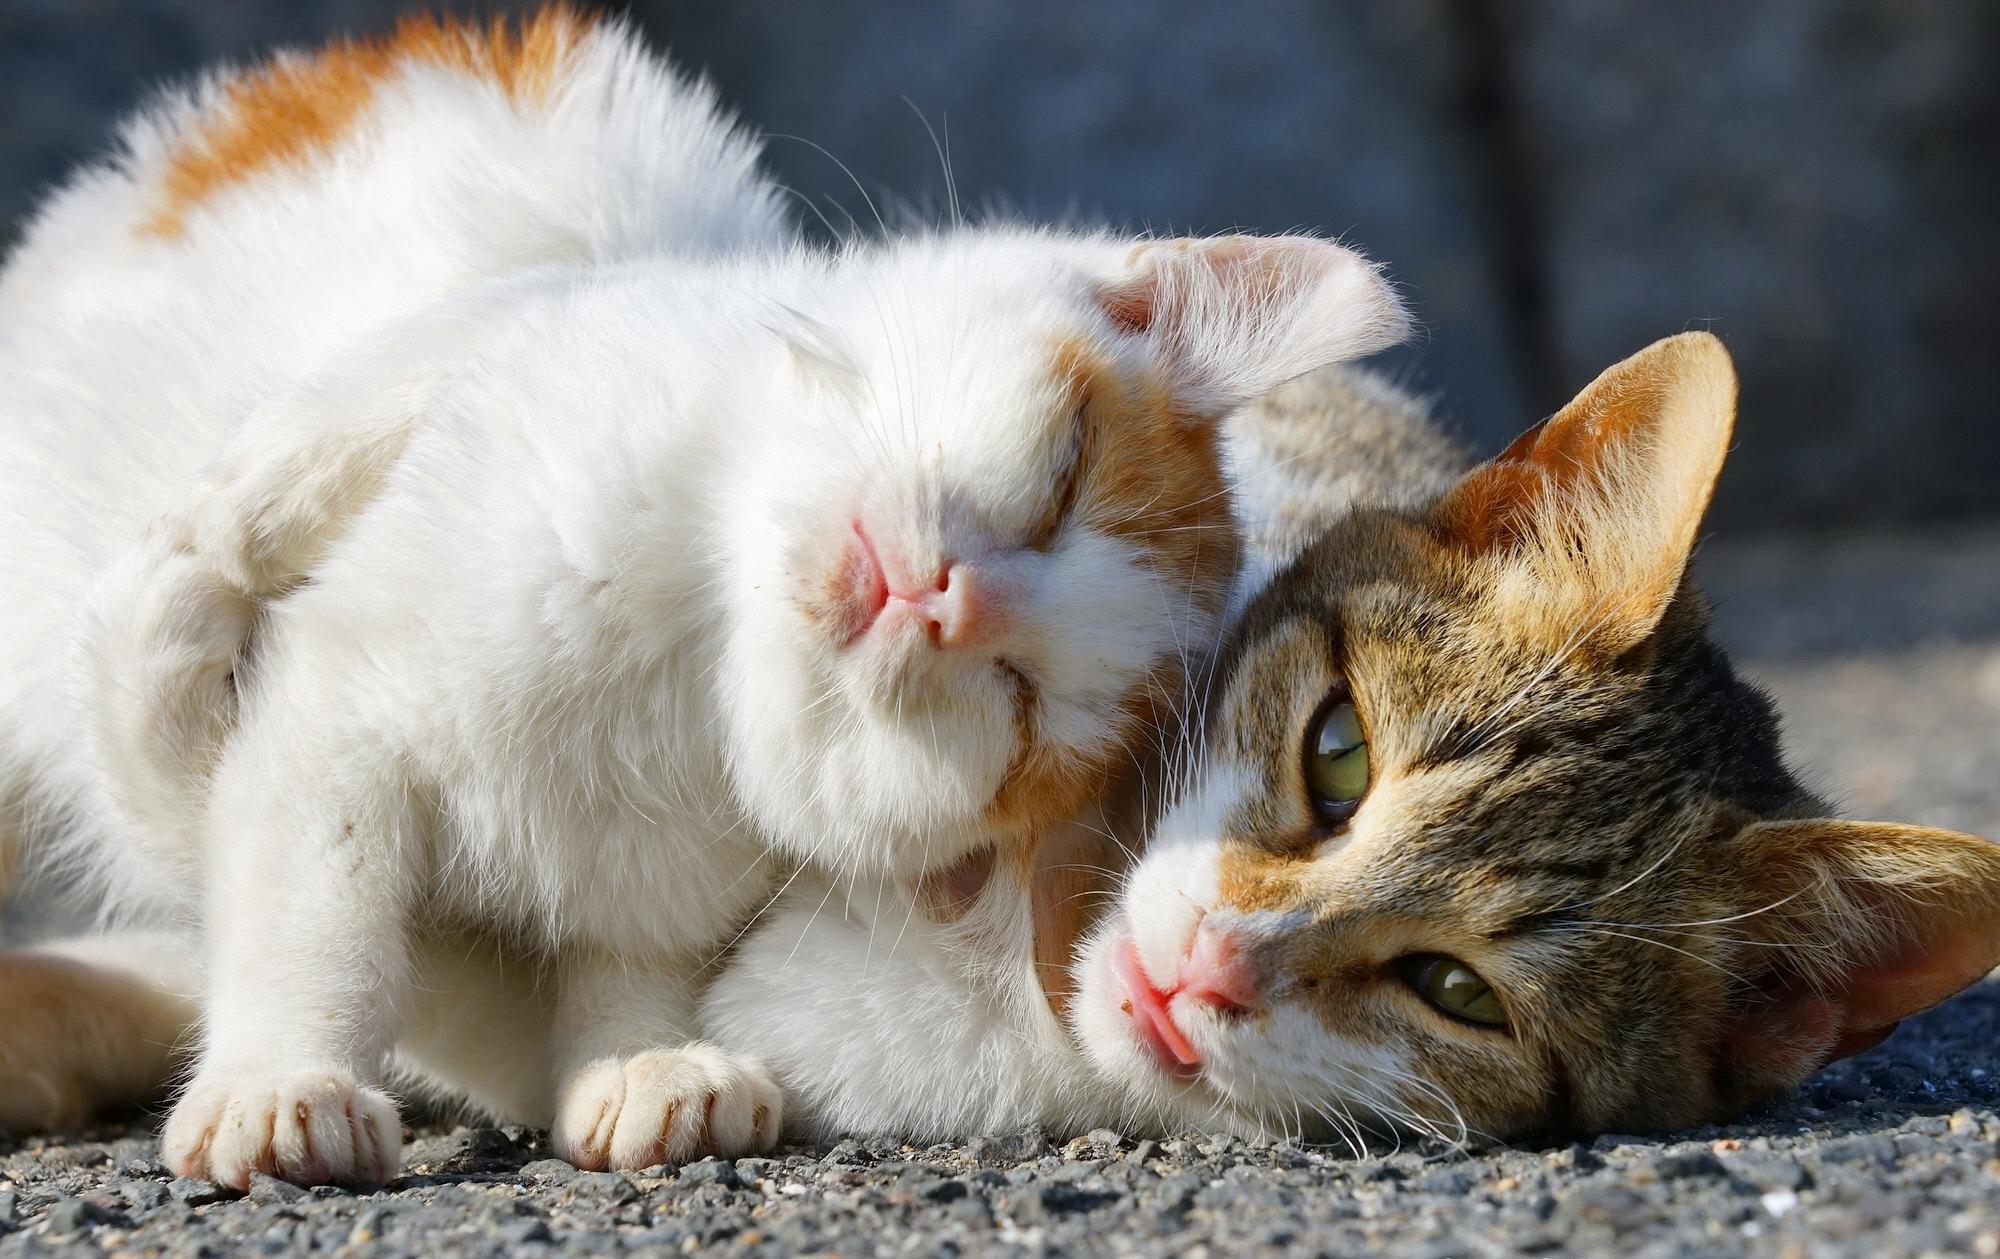 Картинка: Кошки, мордочки, нежится, две, солнце